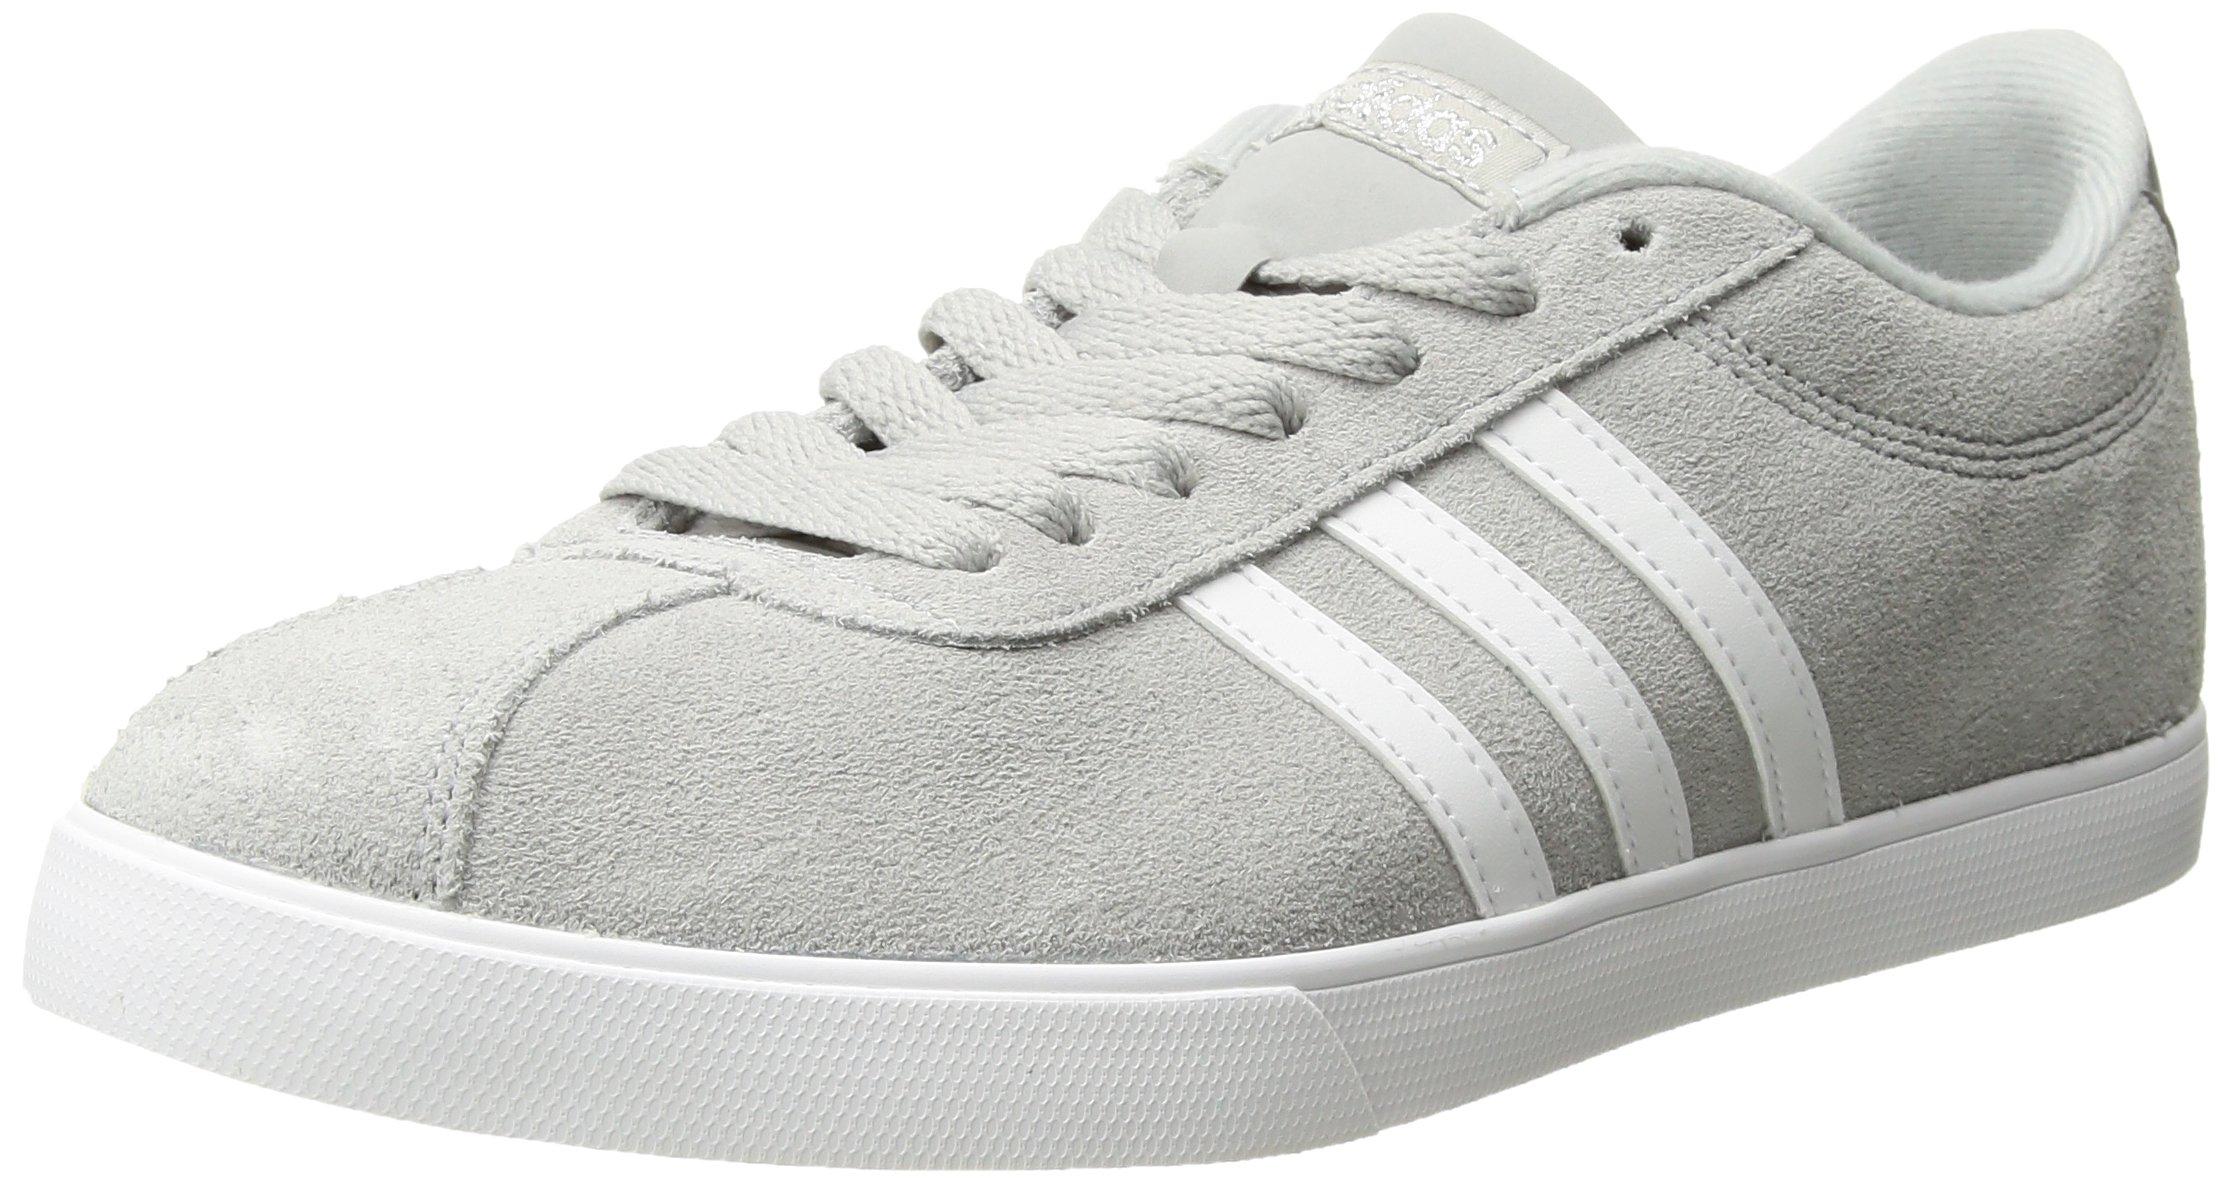 adidas Women's Shoes   Courtset Sneakers -, Light Onix/White/Metallic Silver, (8.5 M US)